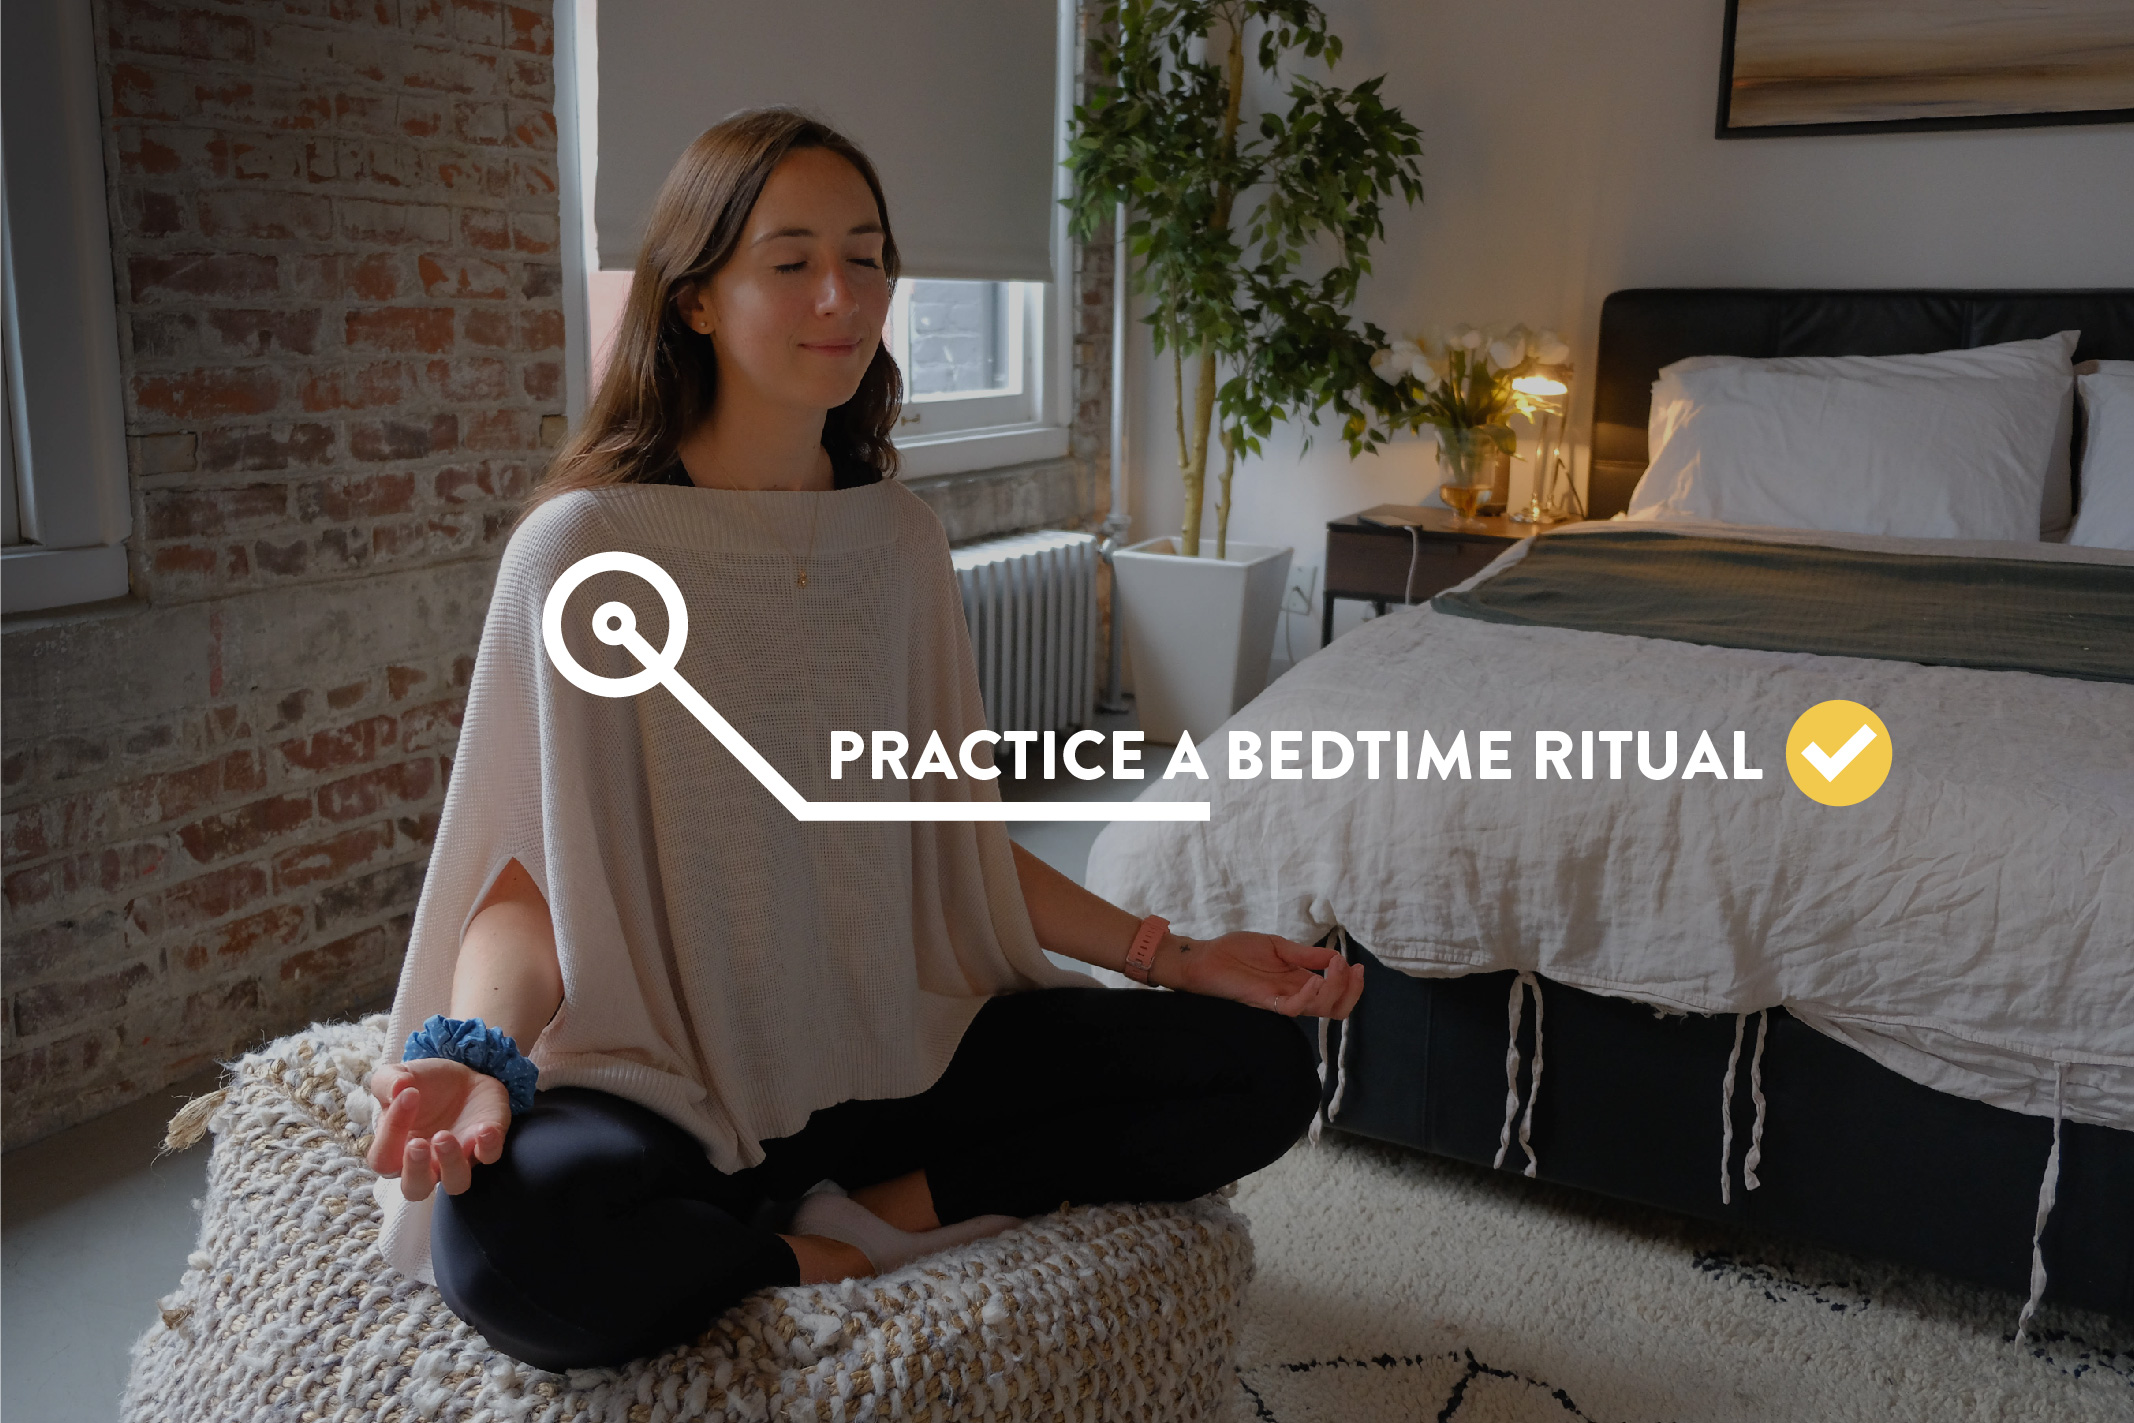 habit-coaching-trainerize-practice-bedtime-ritual